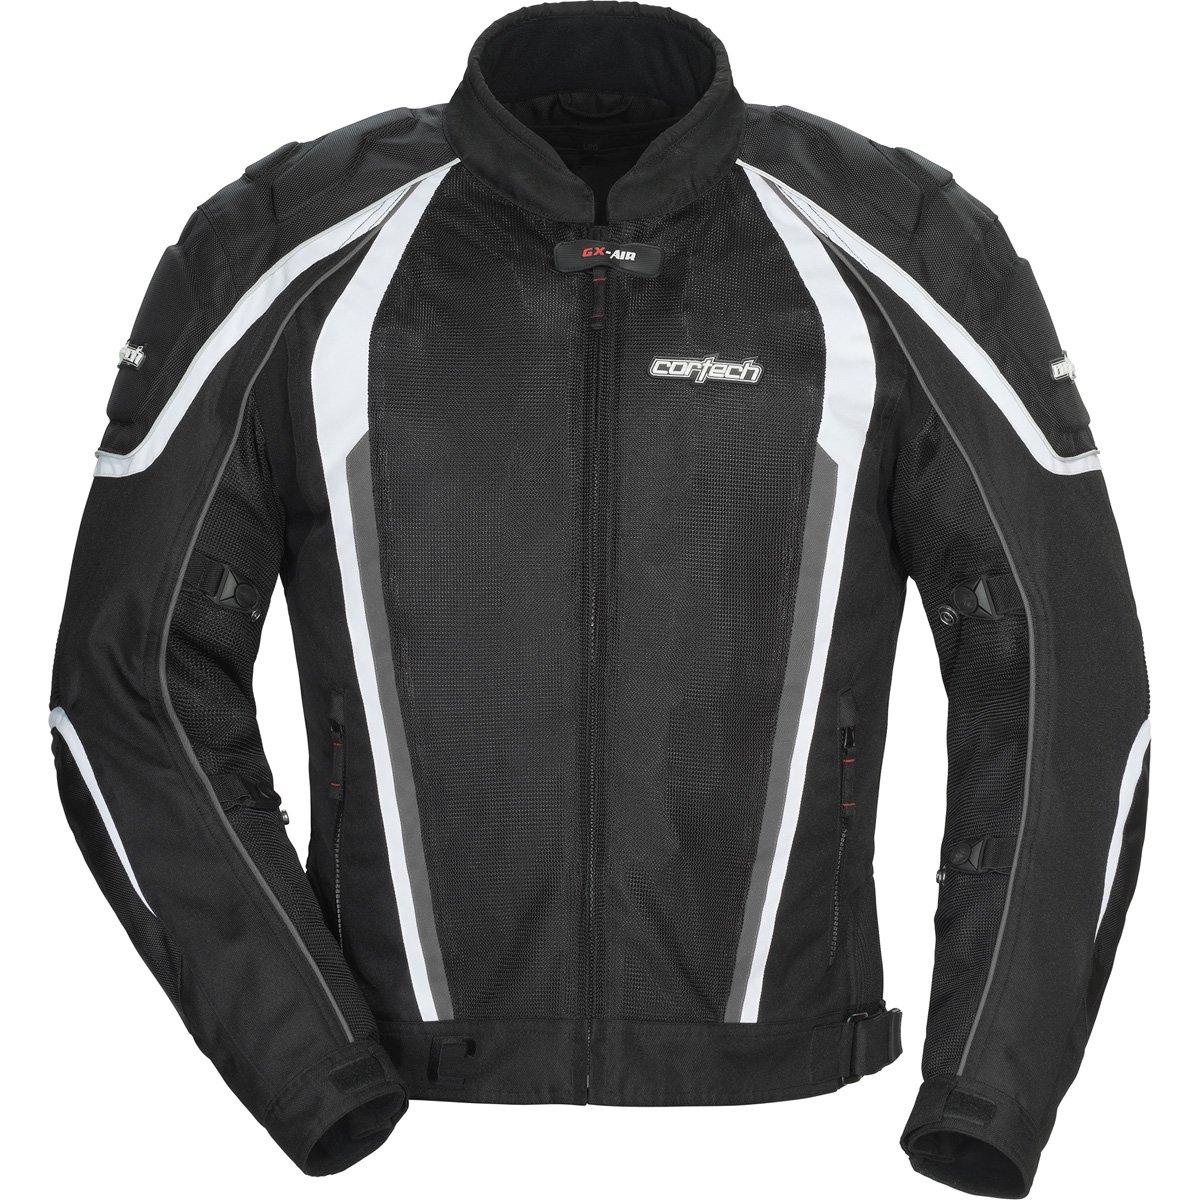 Cortech GX Sport Air 4.0 Adult Mesh Road Race Motorcycle Jacket - Black / Medium